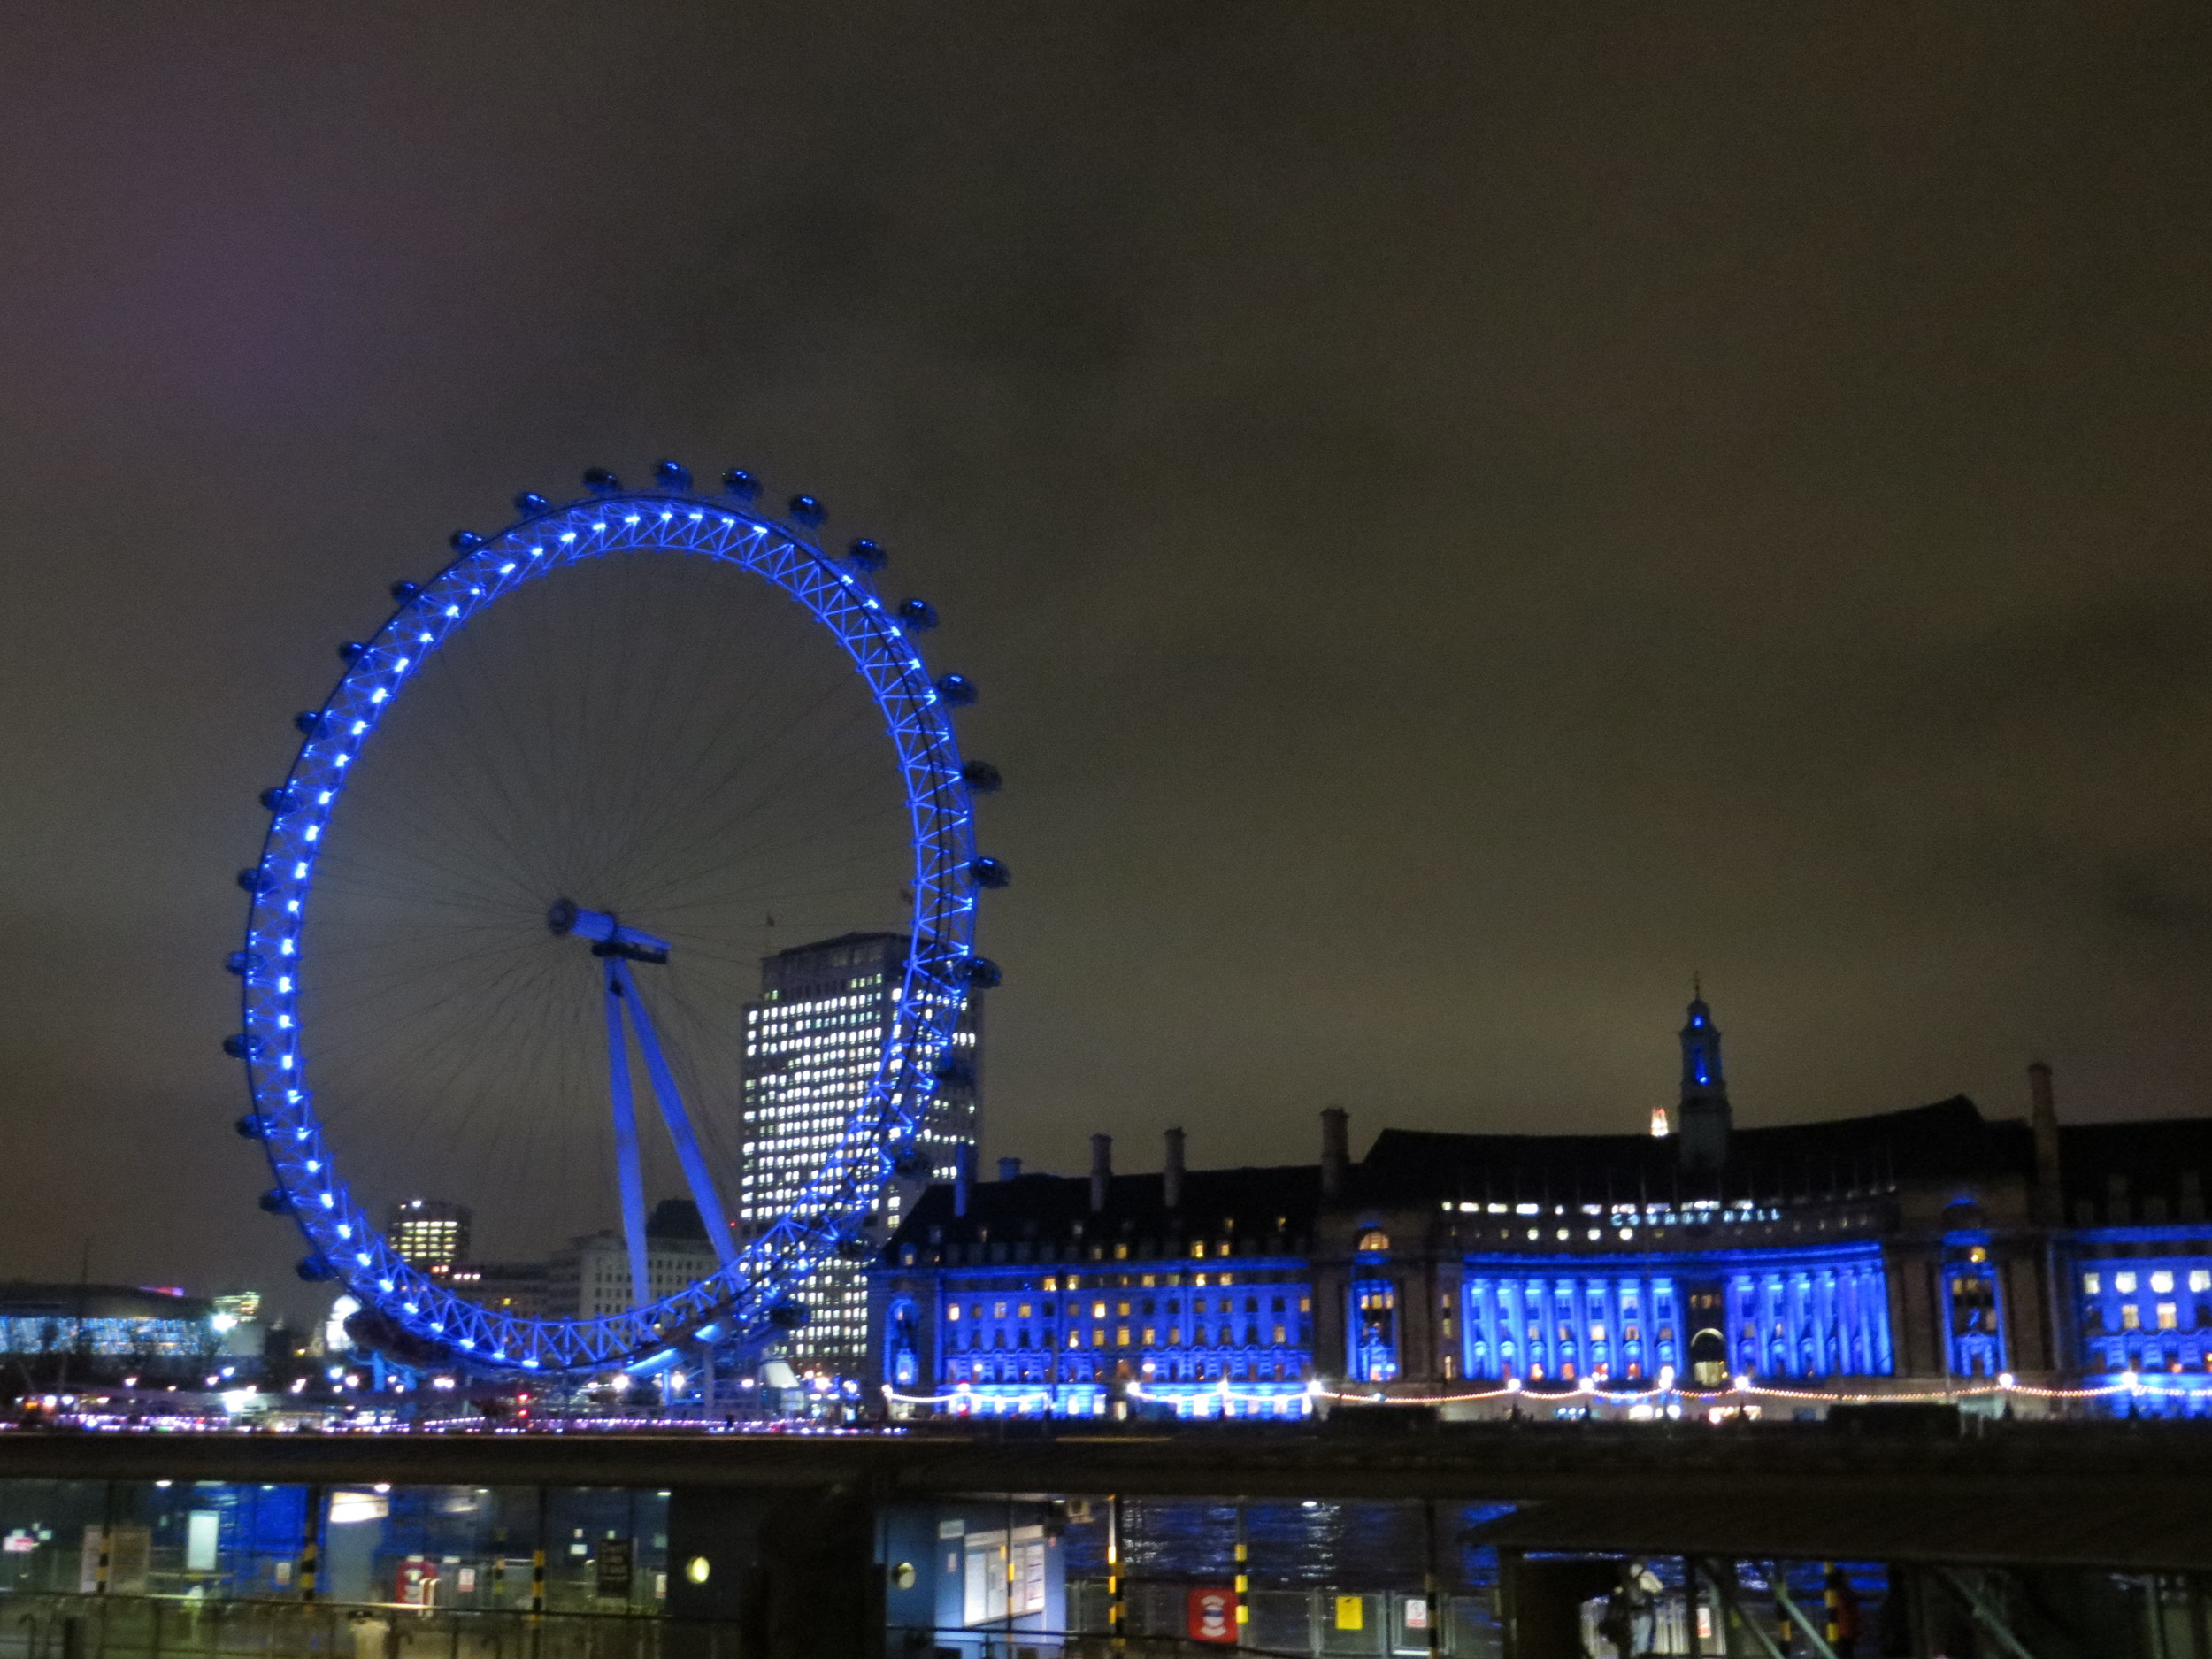 London is beautiful at night